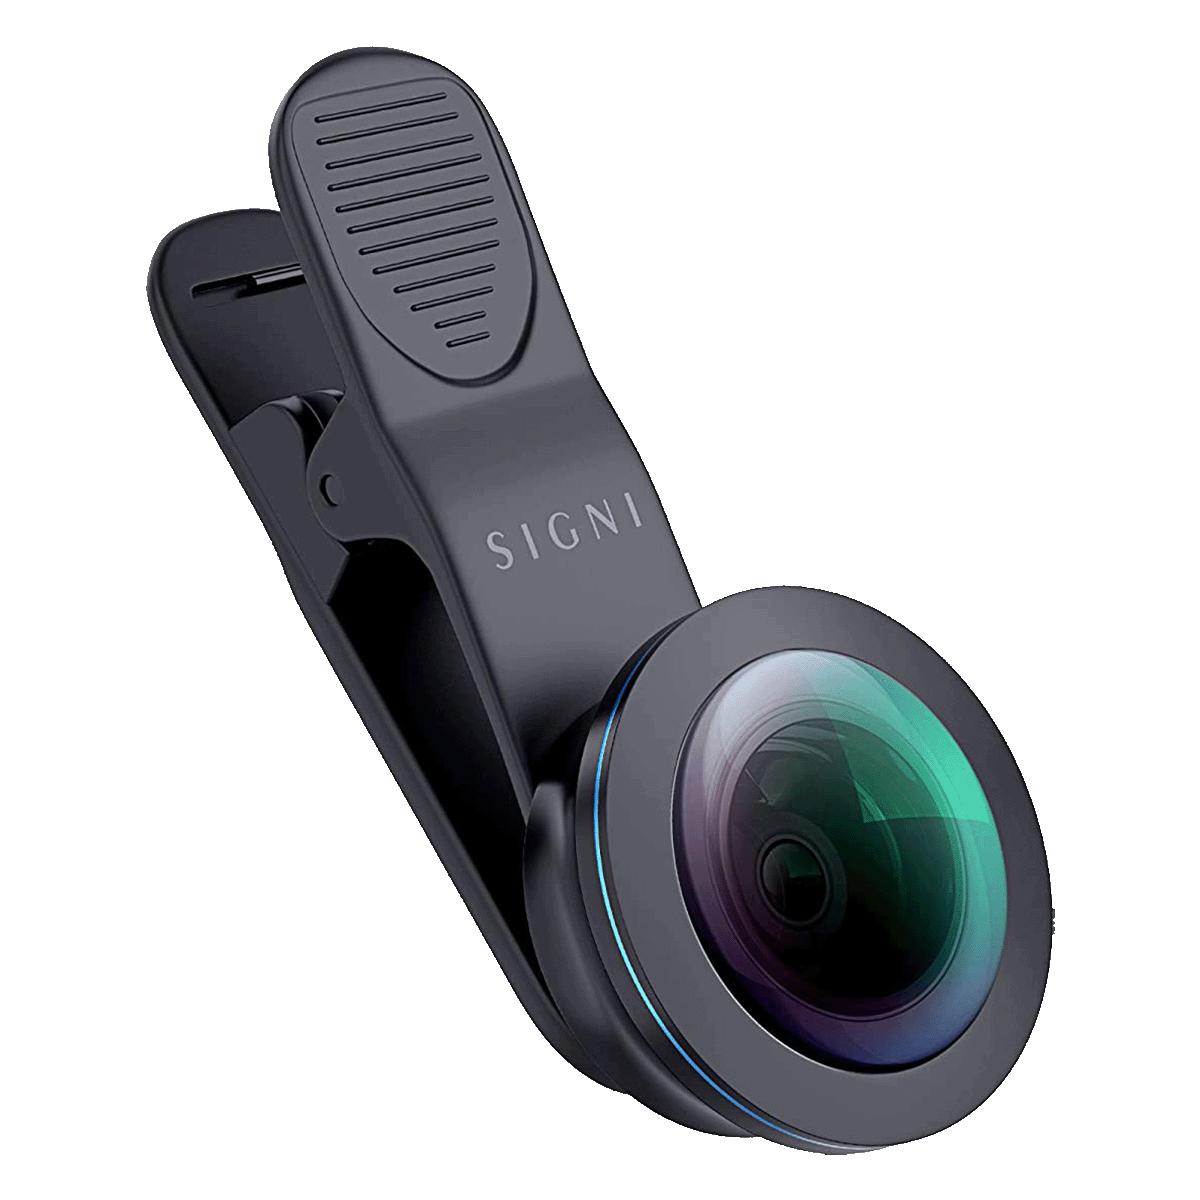 SkyVik Signi One Lens for Mobiles (CL-FE10, Black)_1